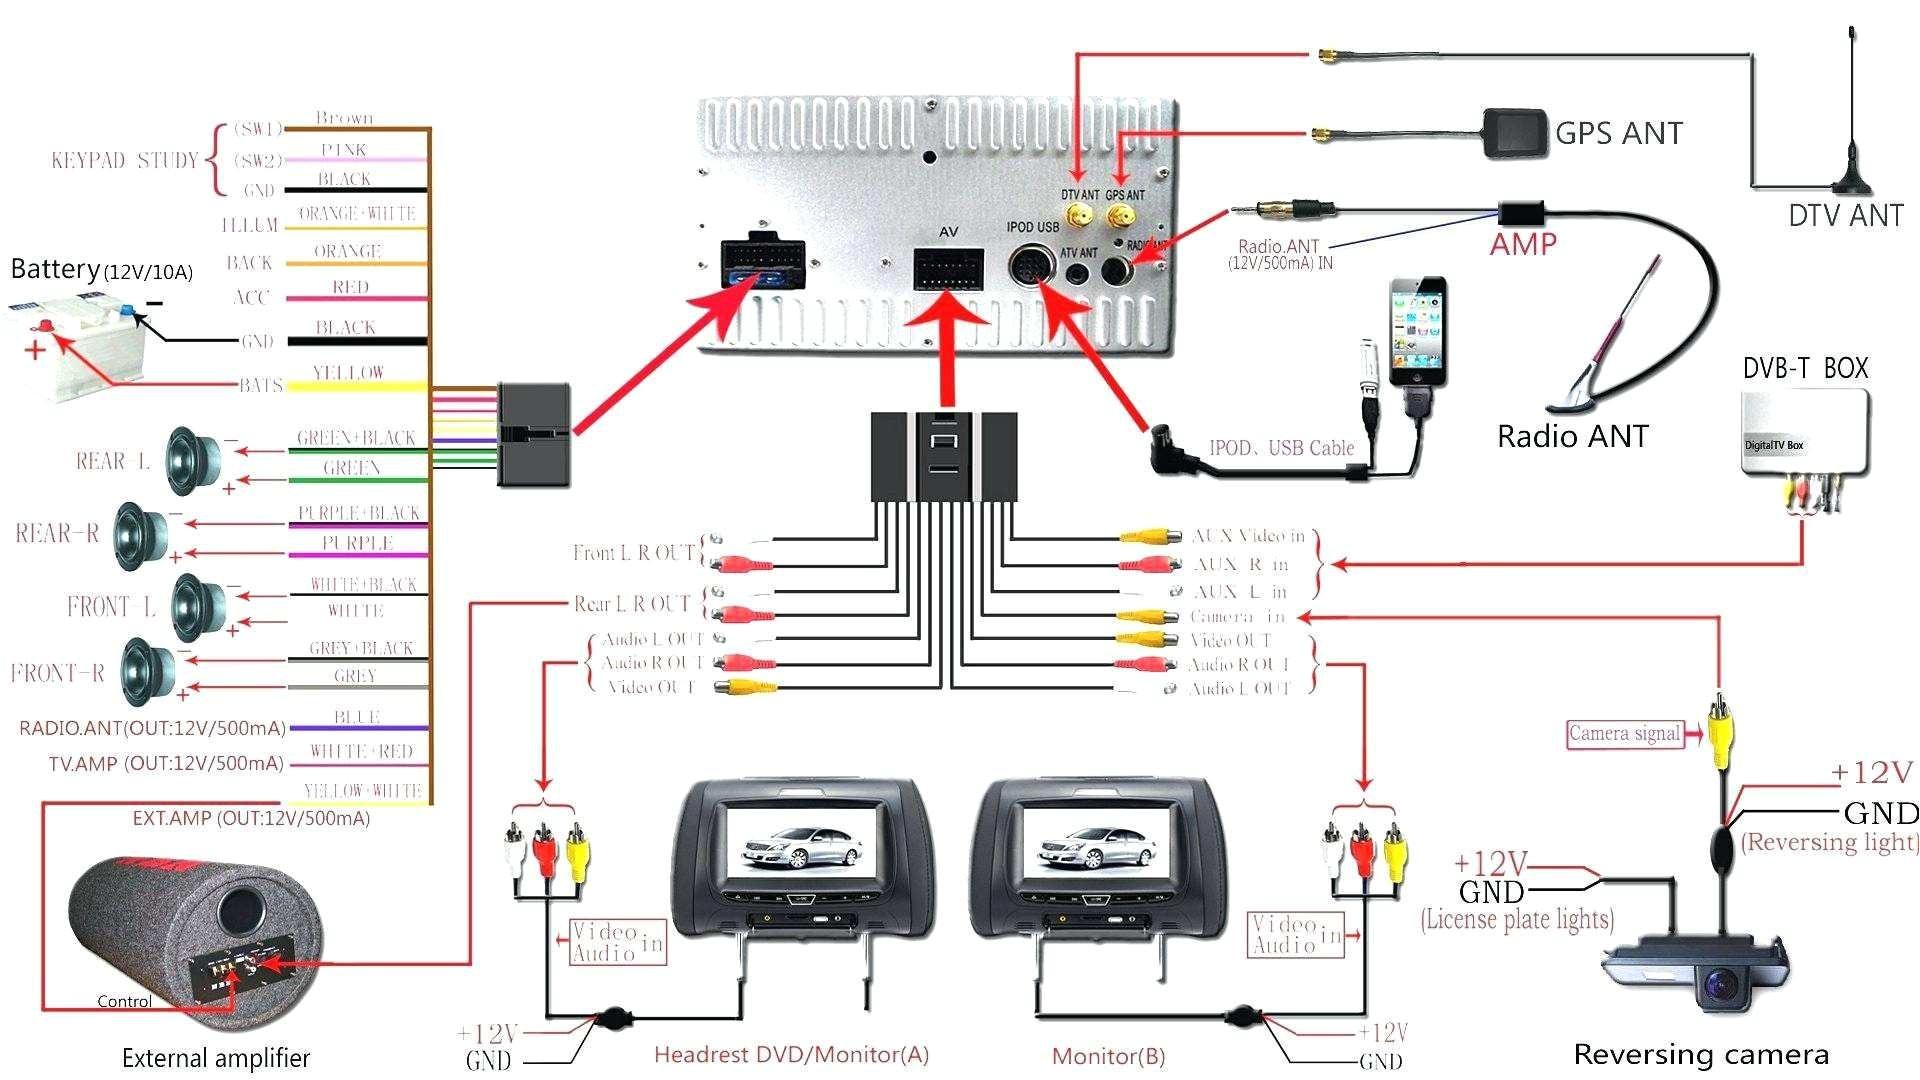 u verse setup diagram wiring diagram expert att uverse wiring diagram wiring diagram meta att uverse